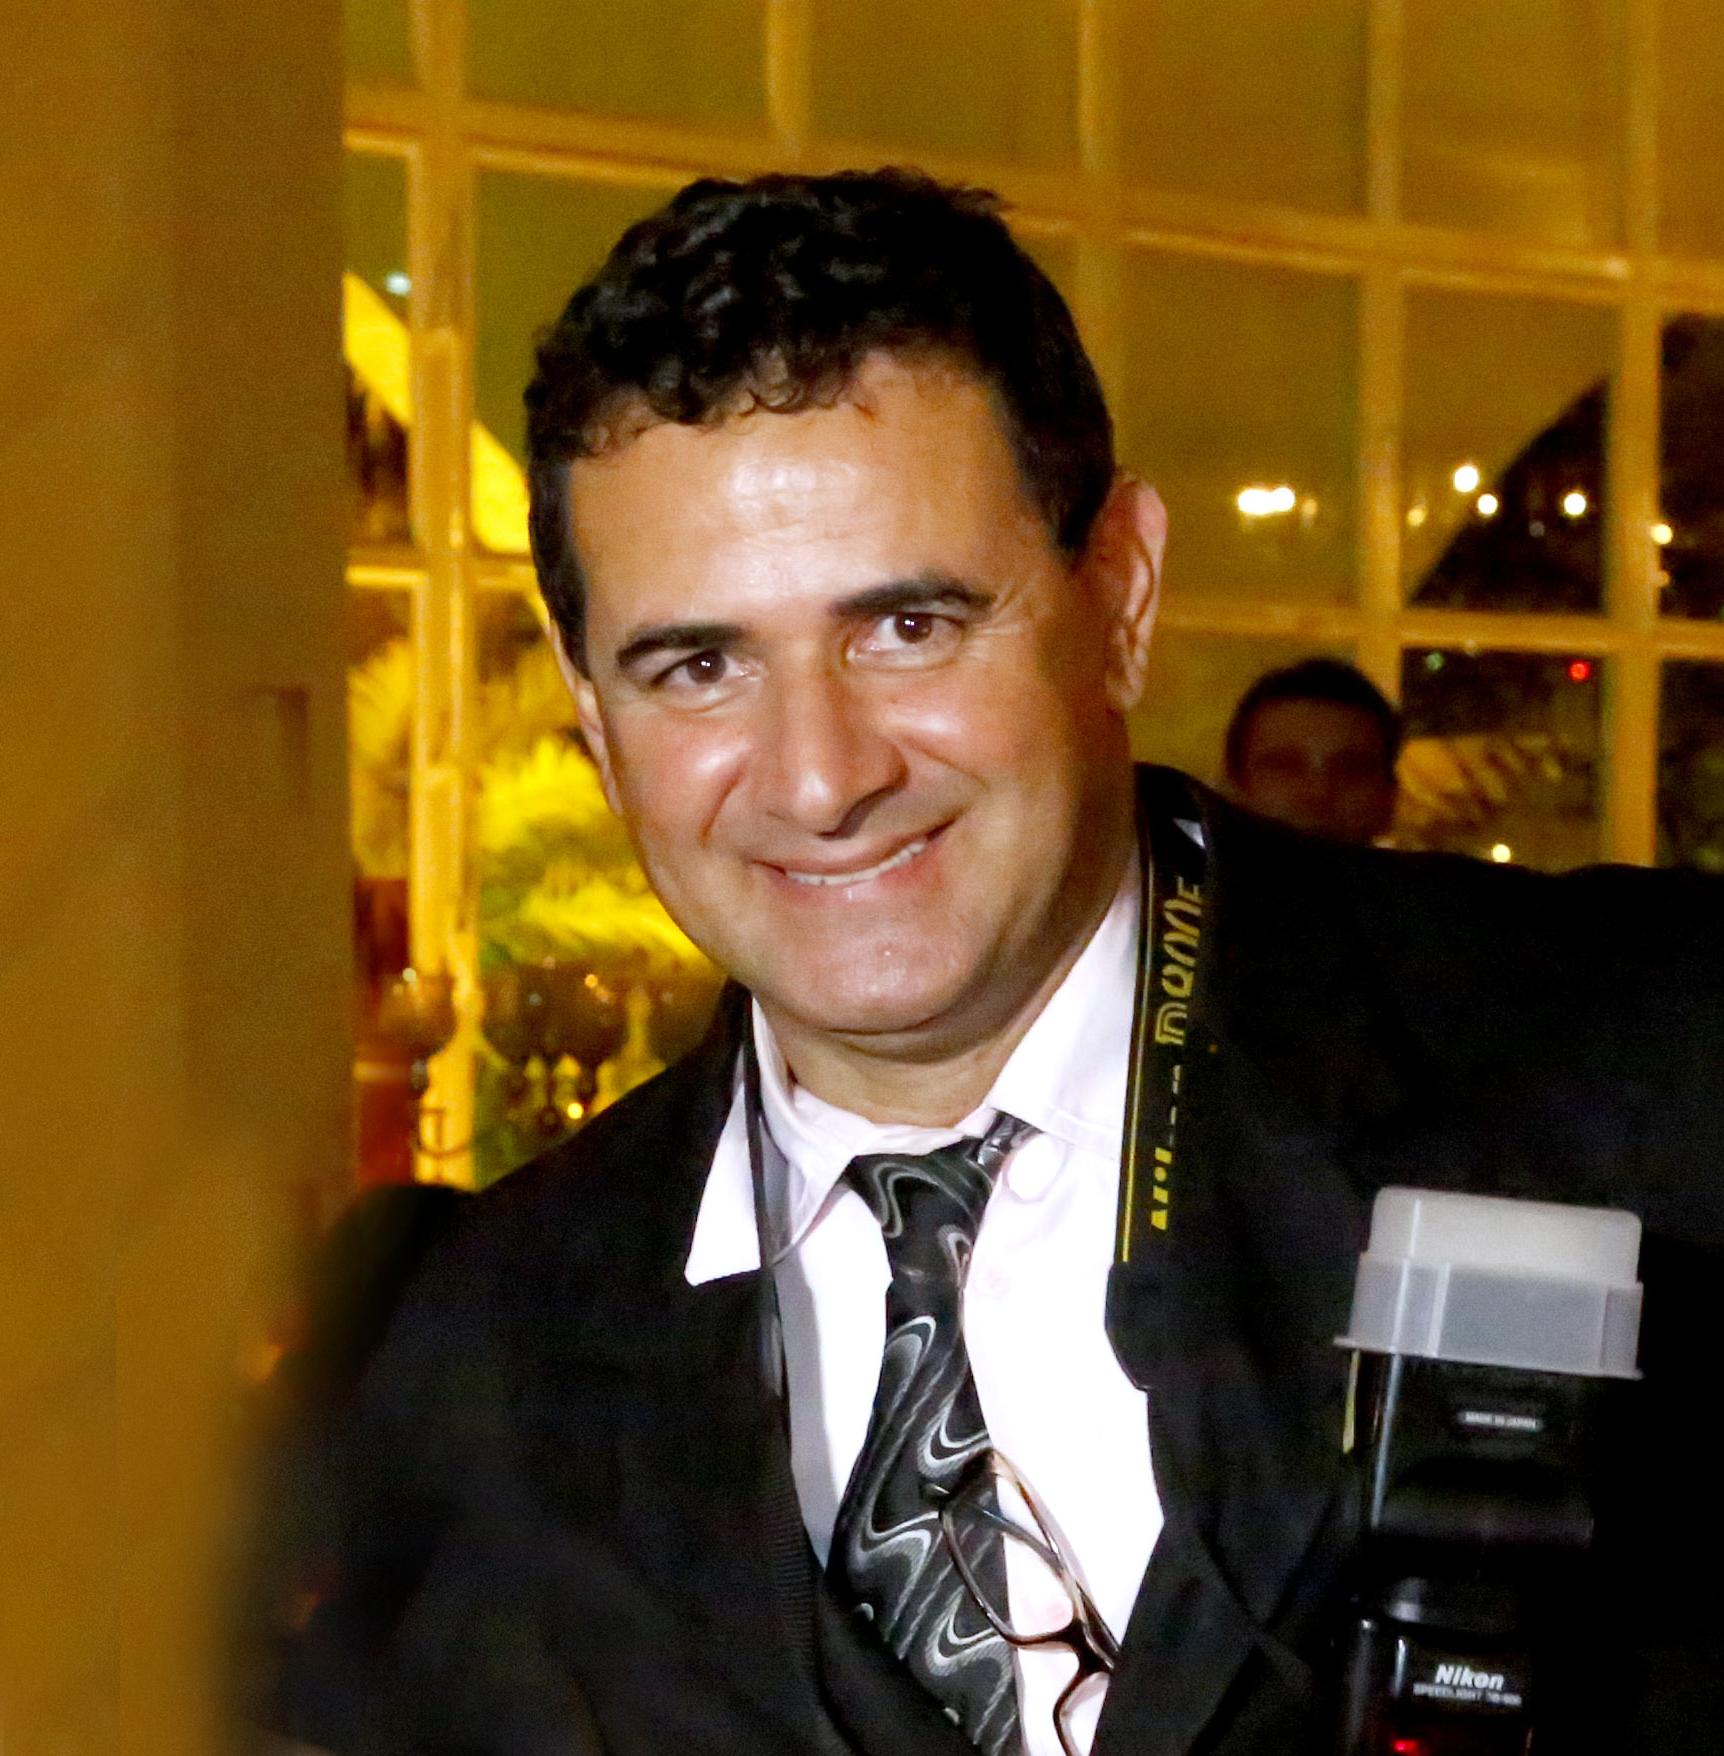 Sobre Fotografo de Casamento Brasilia DF Raniere Pedroza